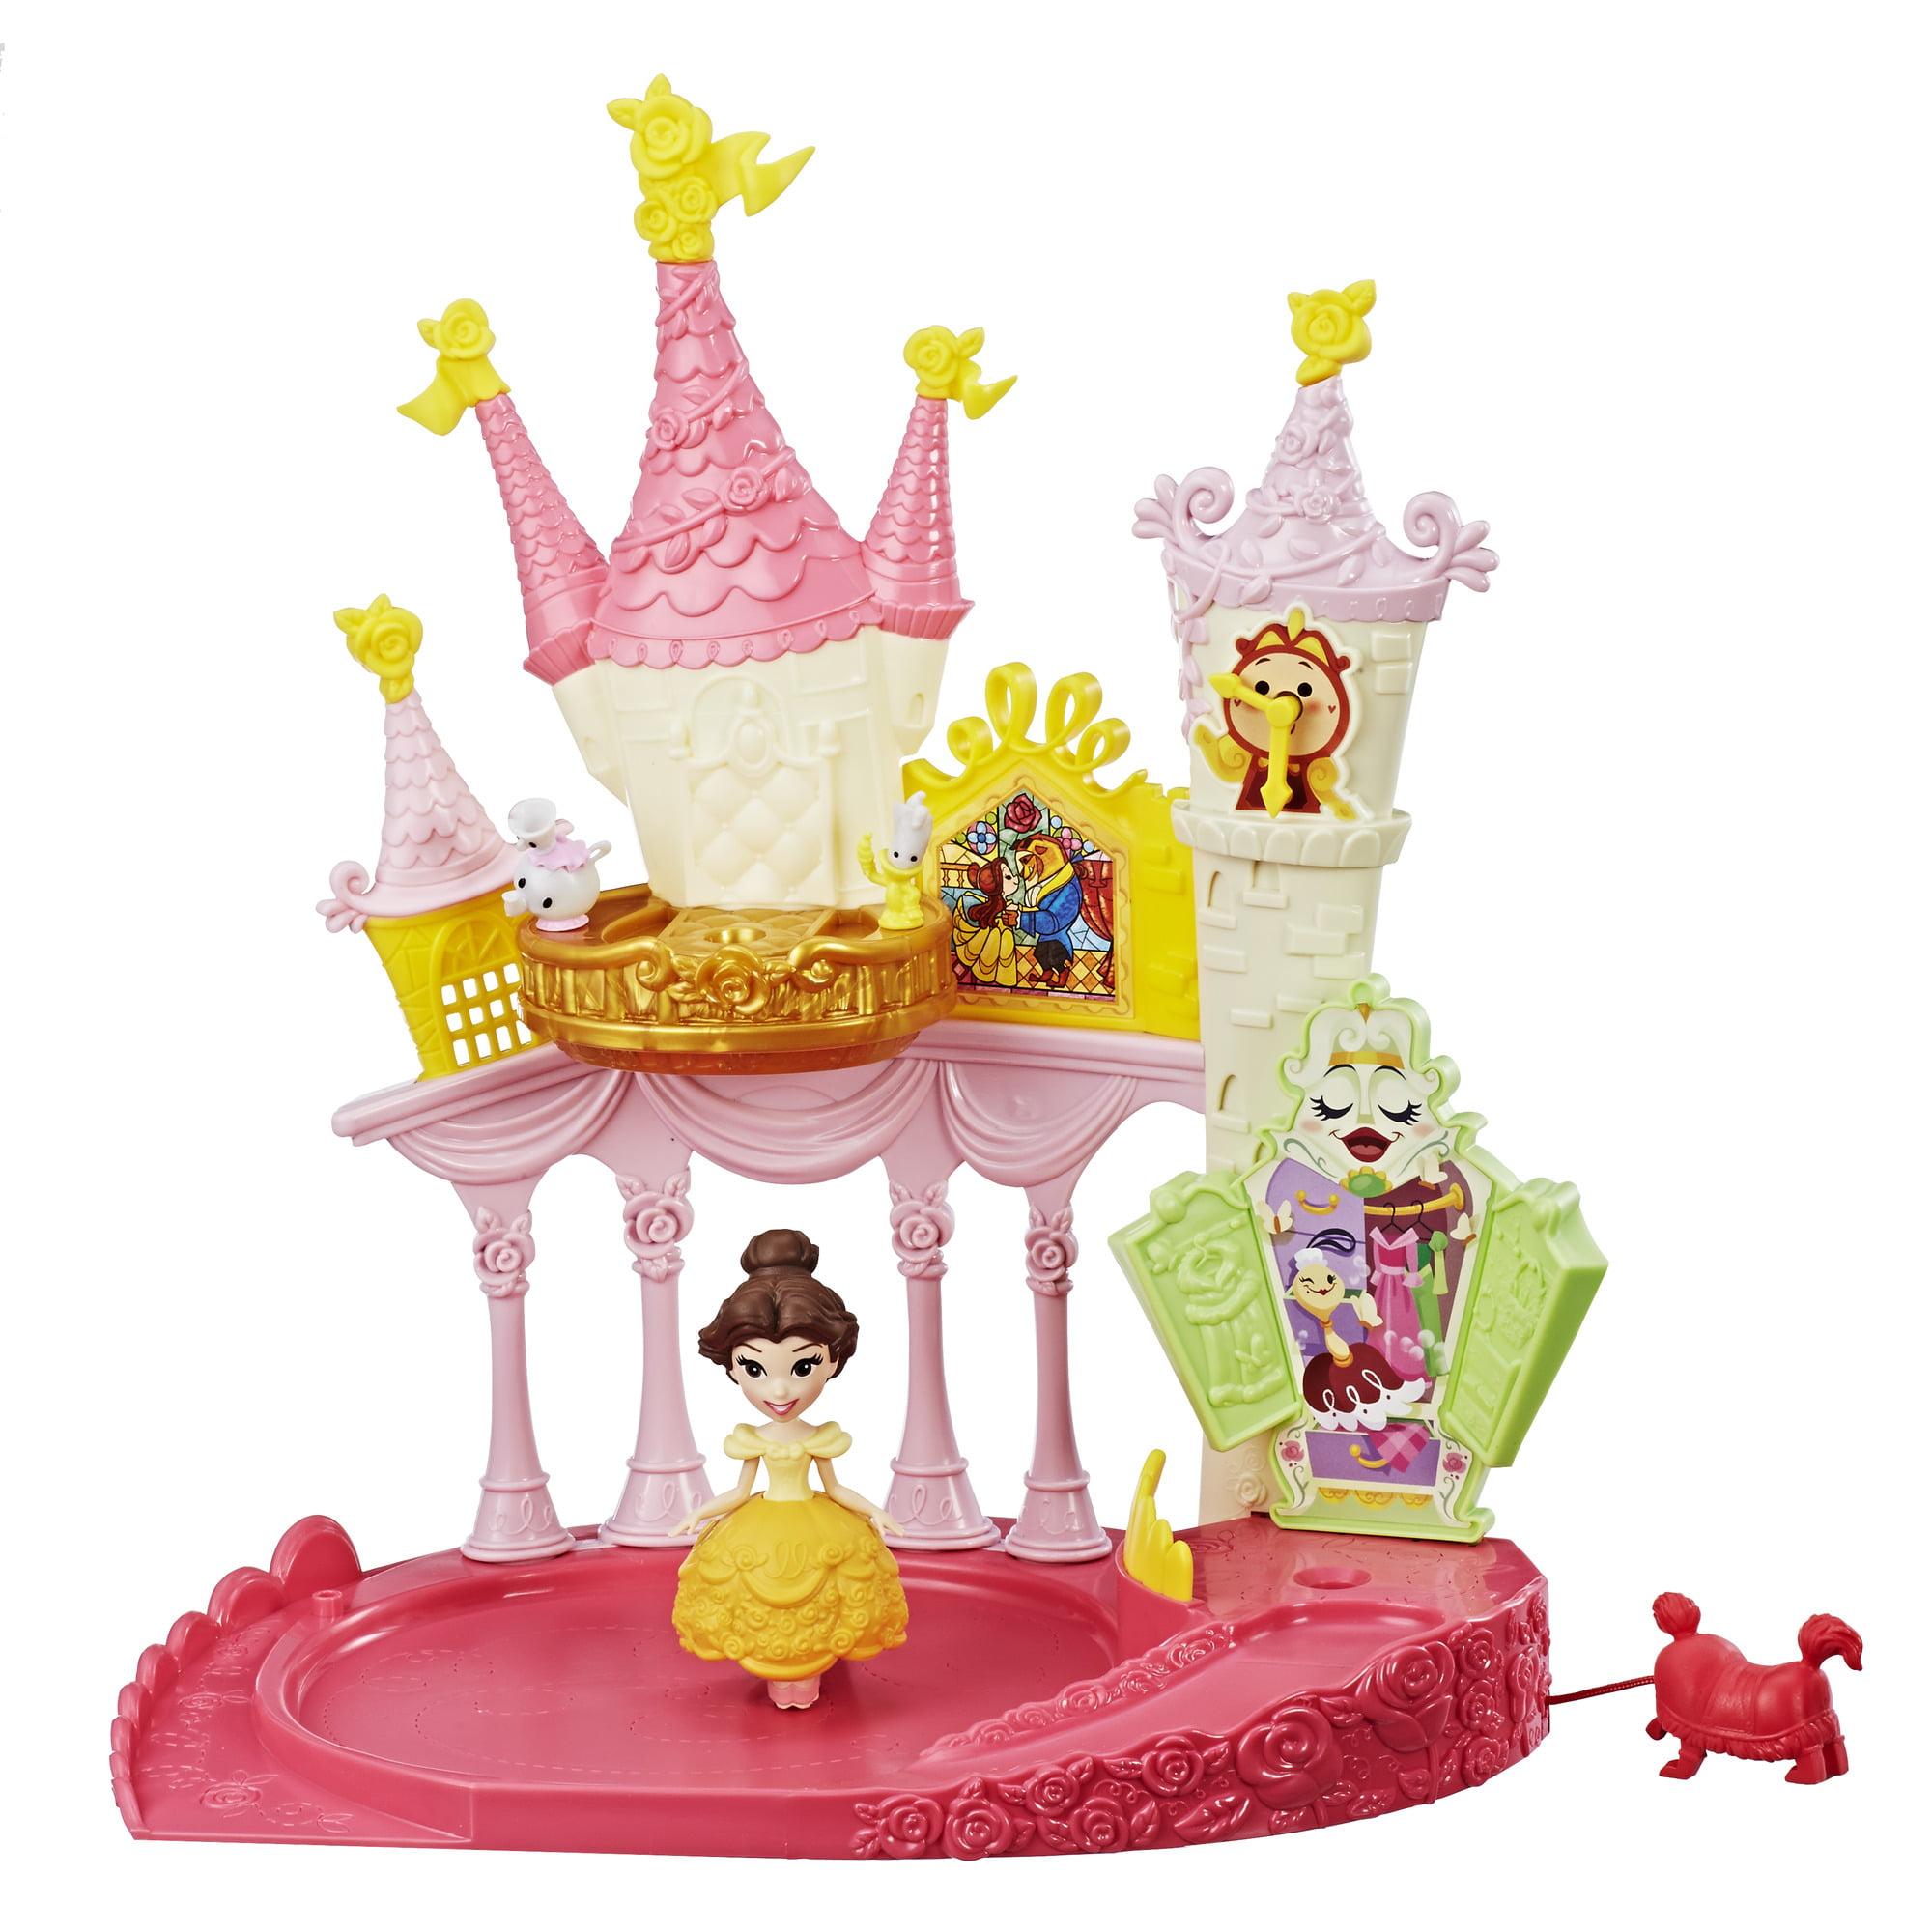 Disney Princess Dance 'n Twirl Ballroom by Hasbro Inc.